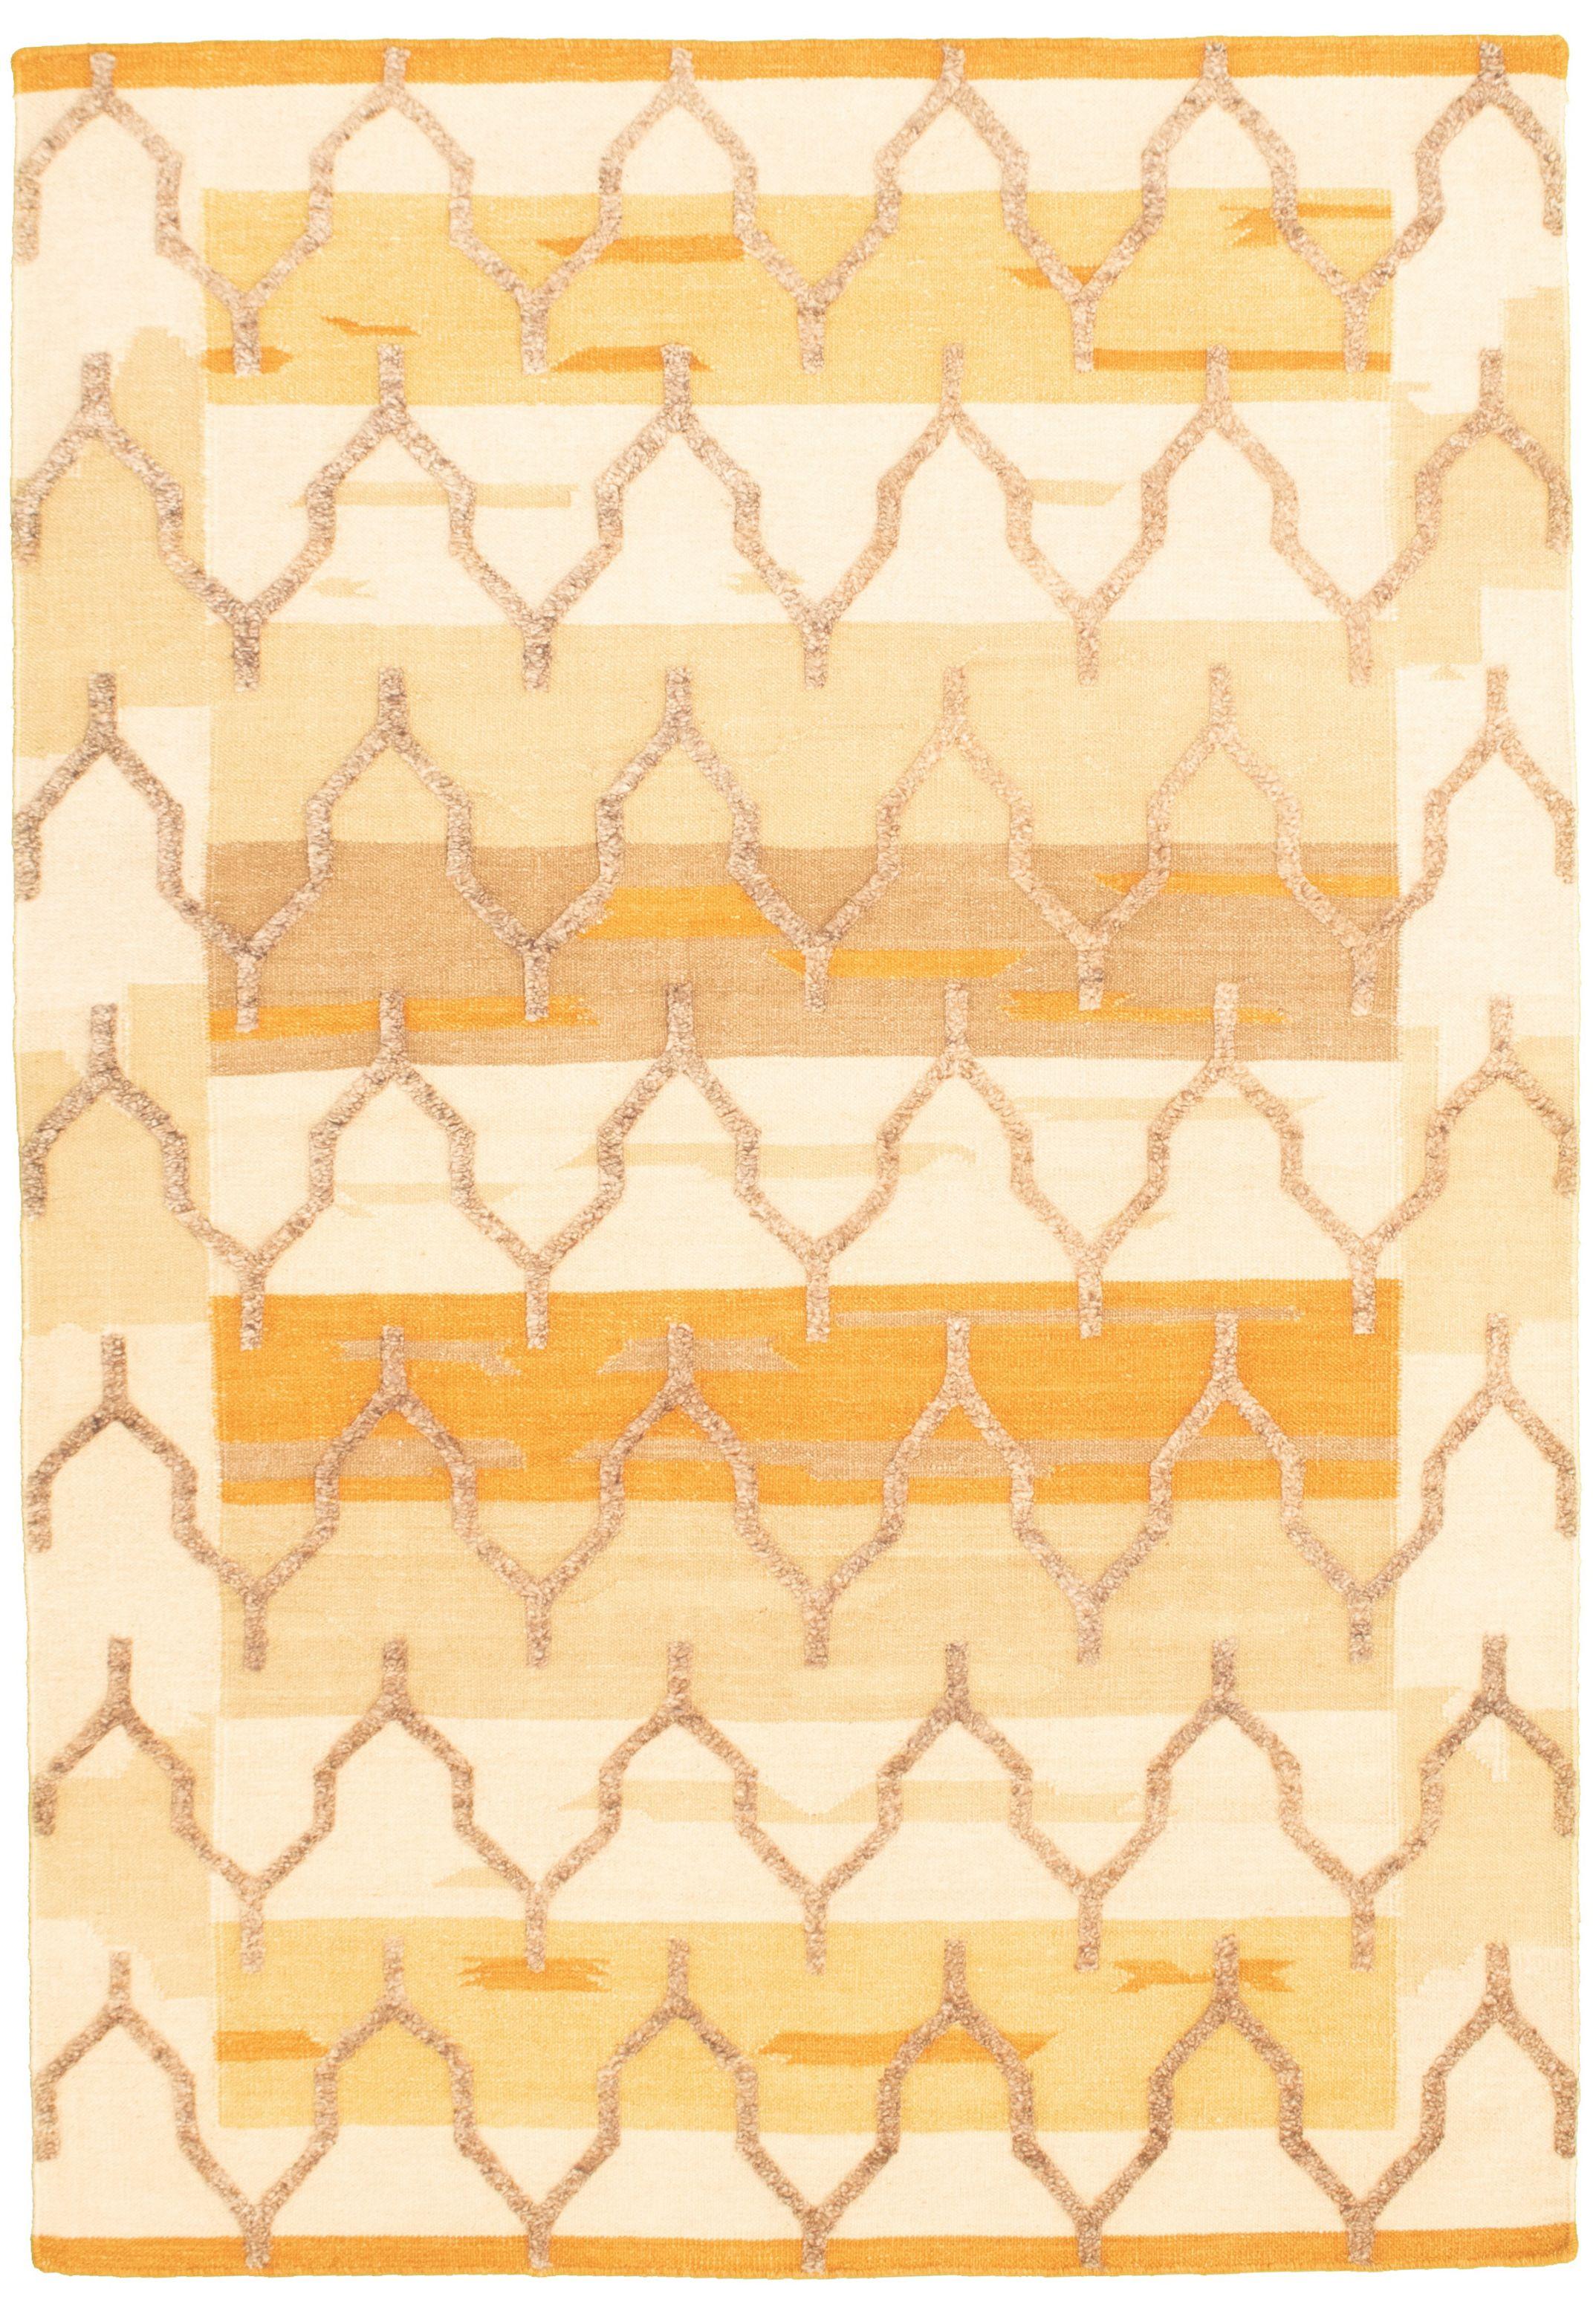 "Hand woven Cambridge Brown, Khaki Wool Kilim 5'4"" x 7'10"" Size: 5'4"" x 7'10"""